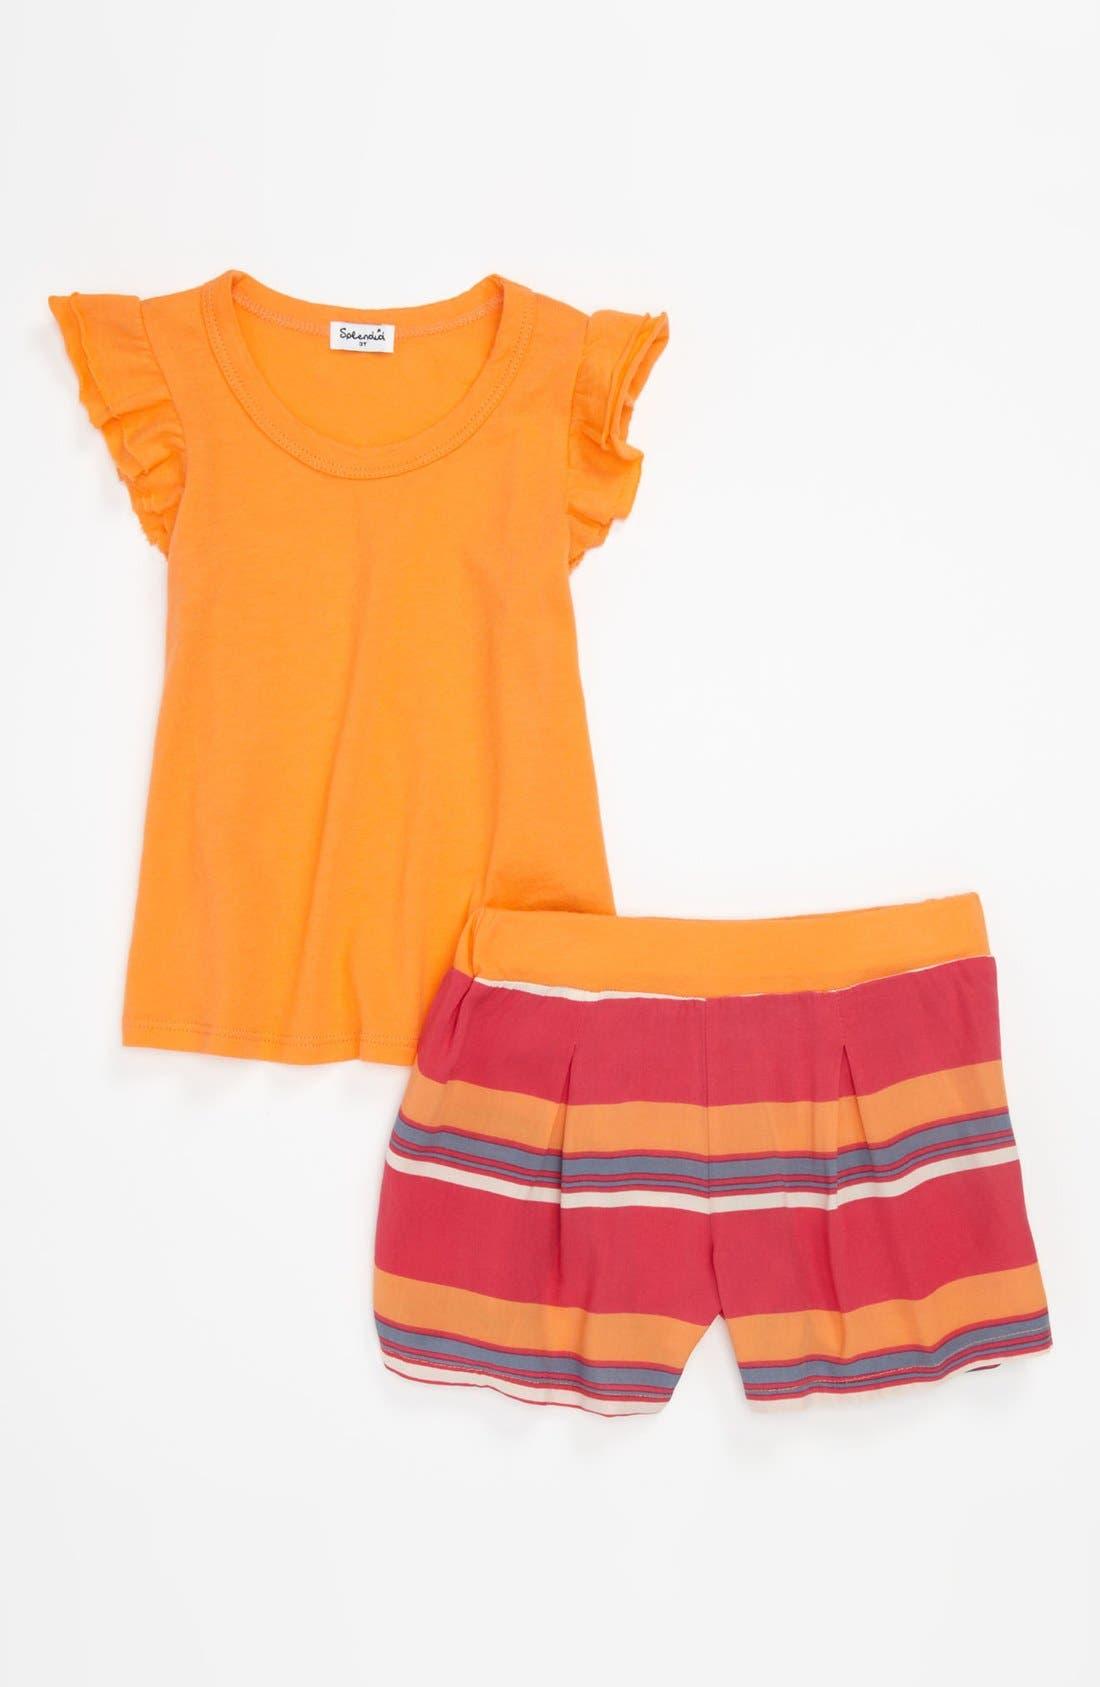 Main Image - Splendid 'Cannes' Stripe Voile Short Set (Toddler)